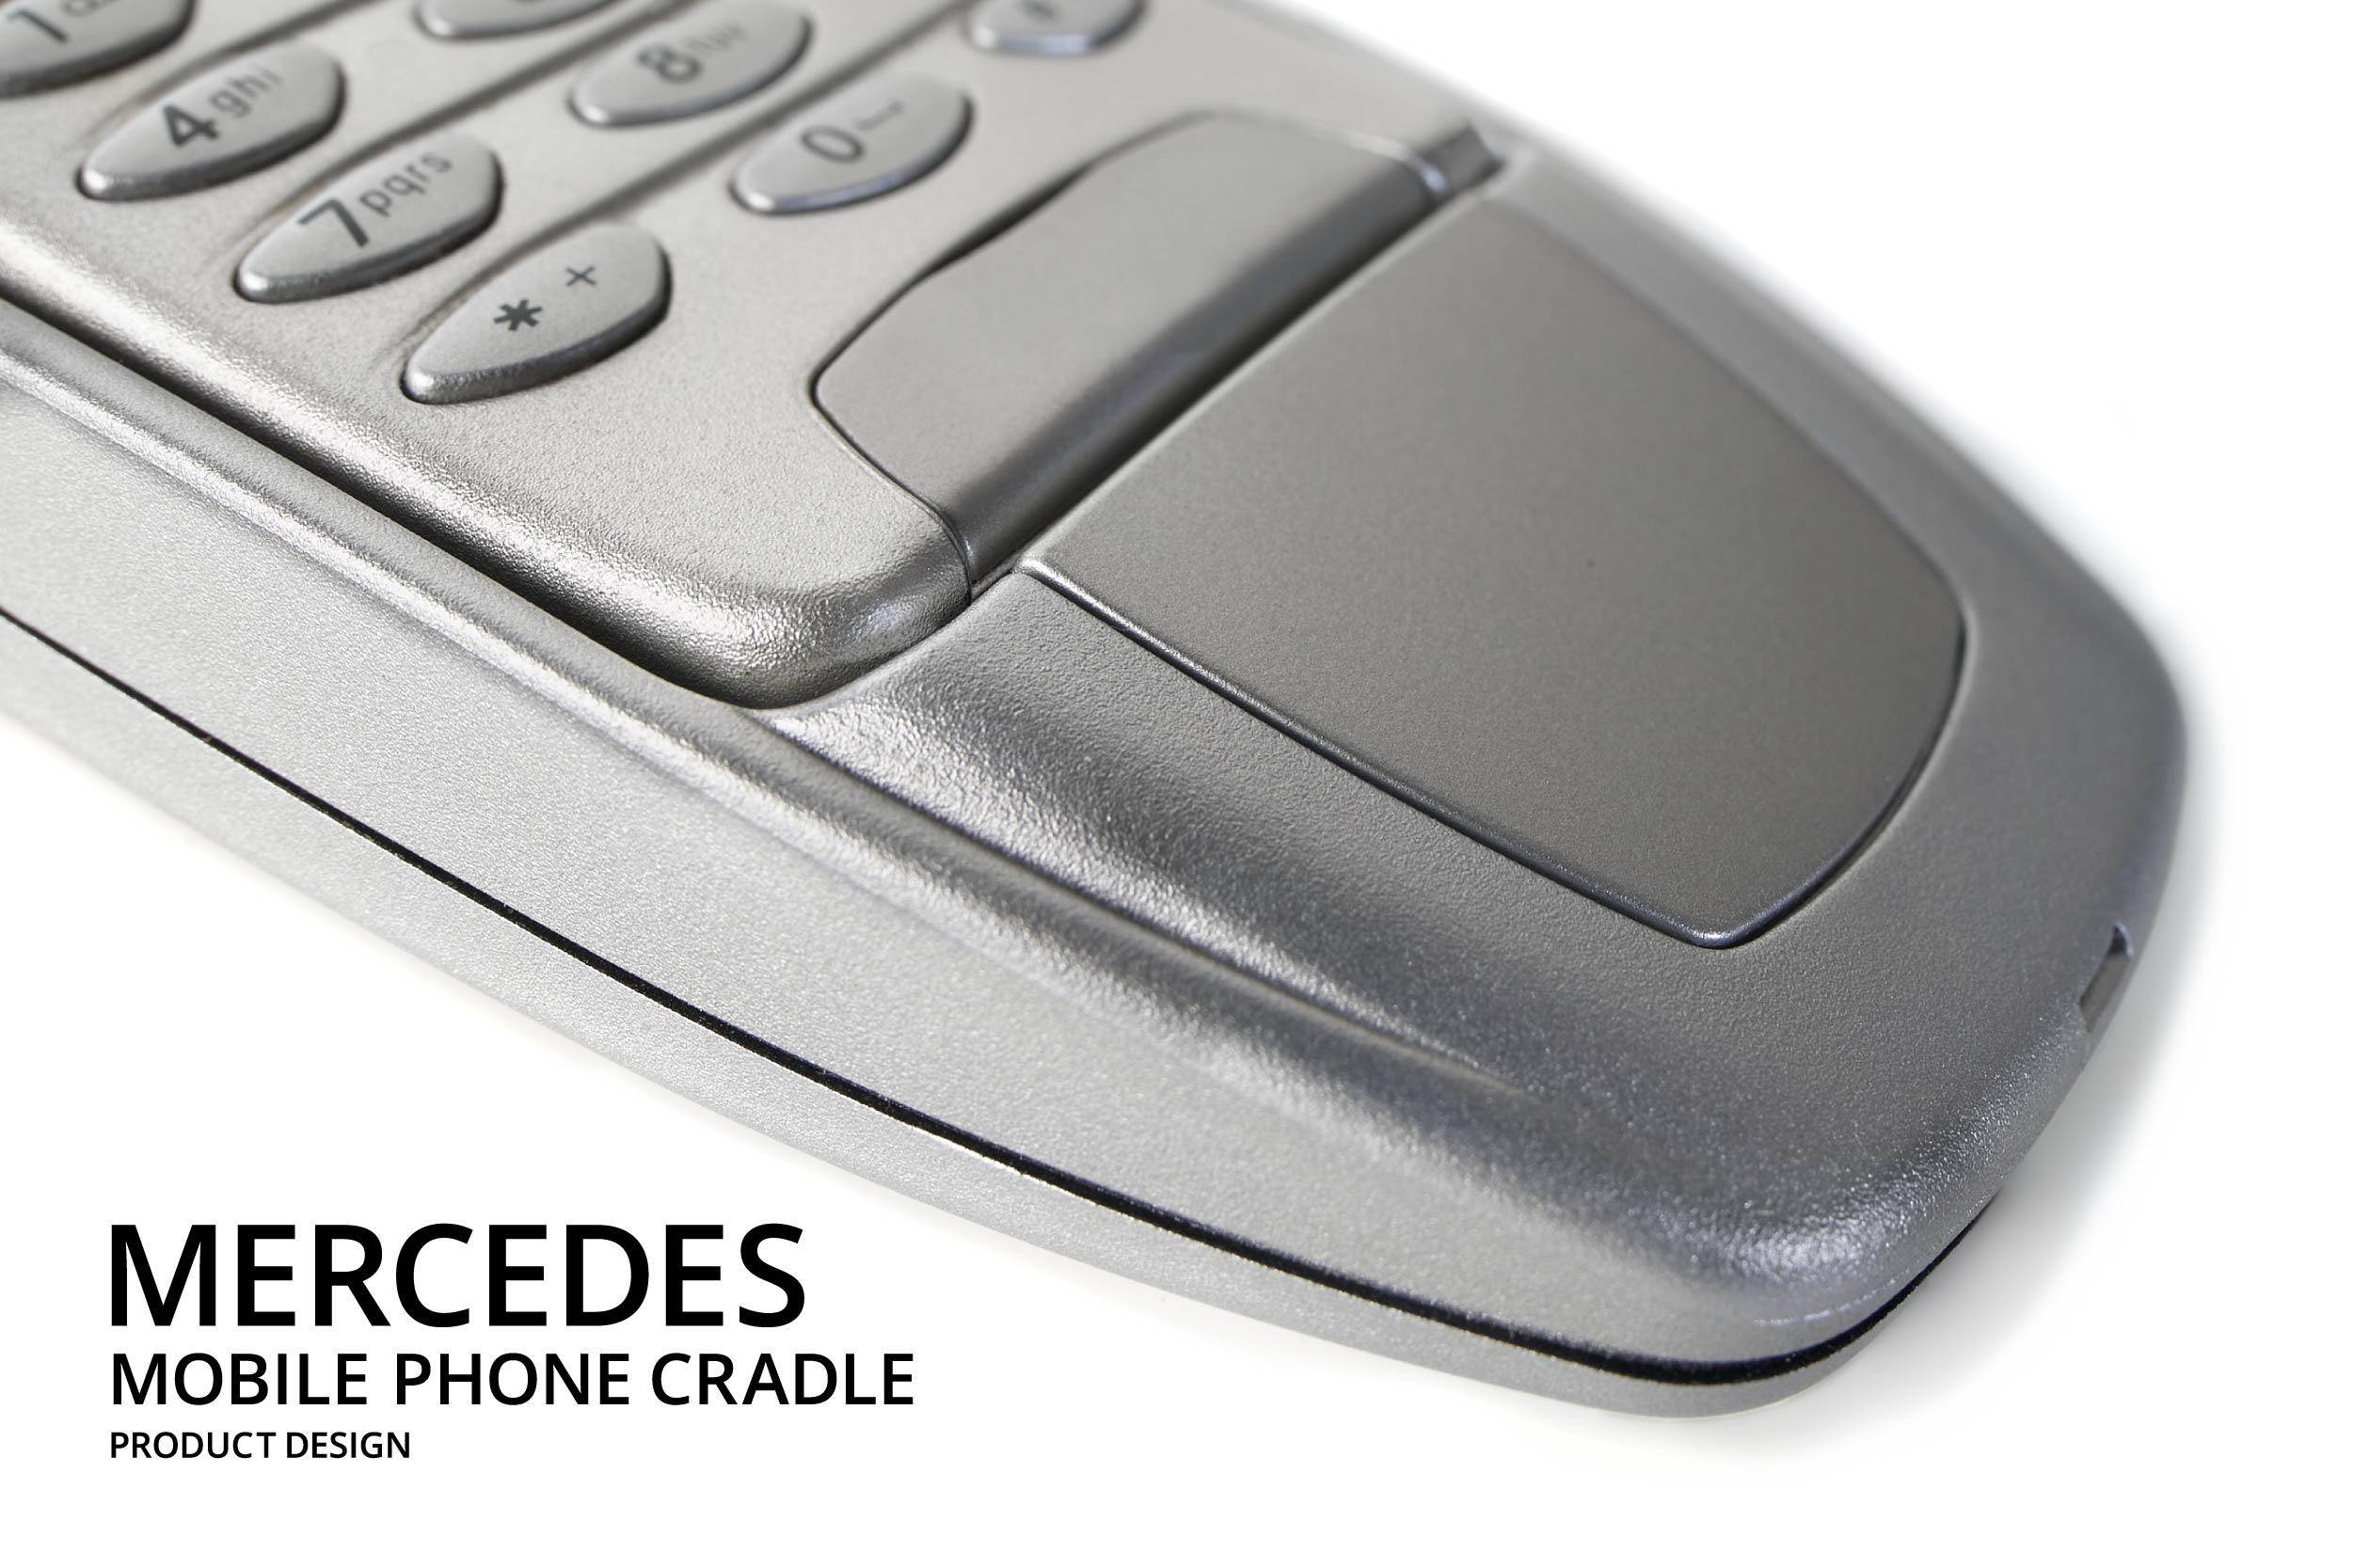 MERCEDES-CRADLE-NOKIA-1